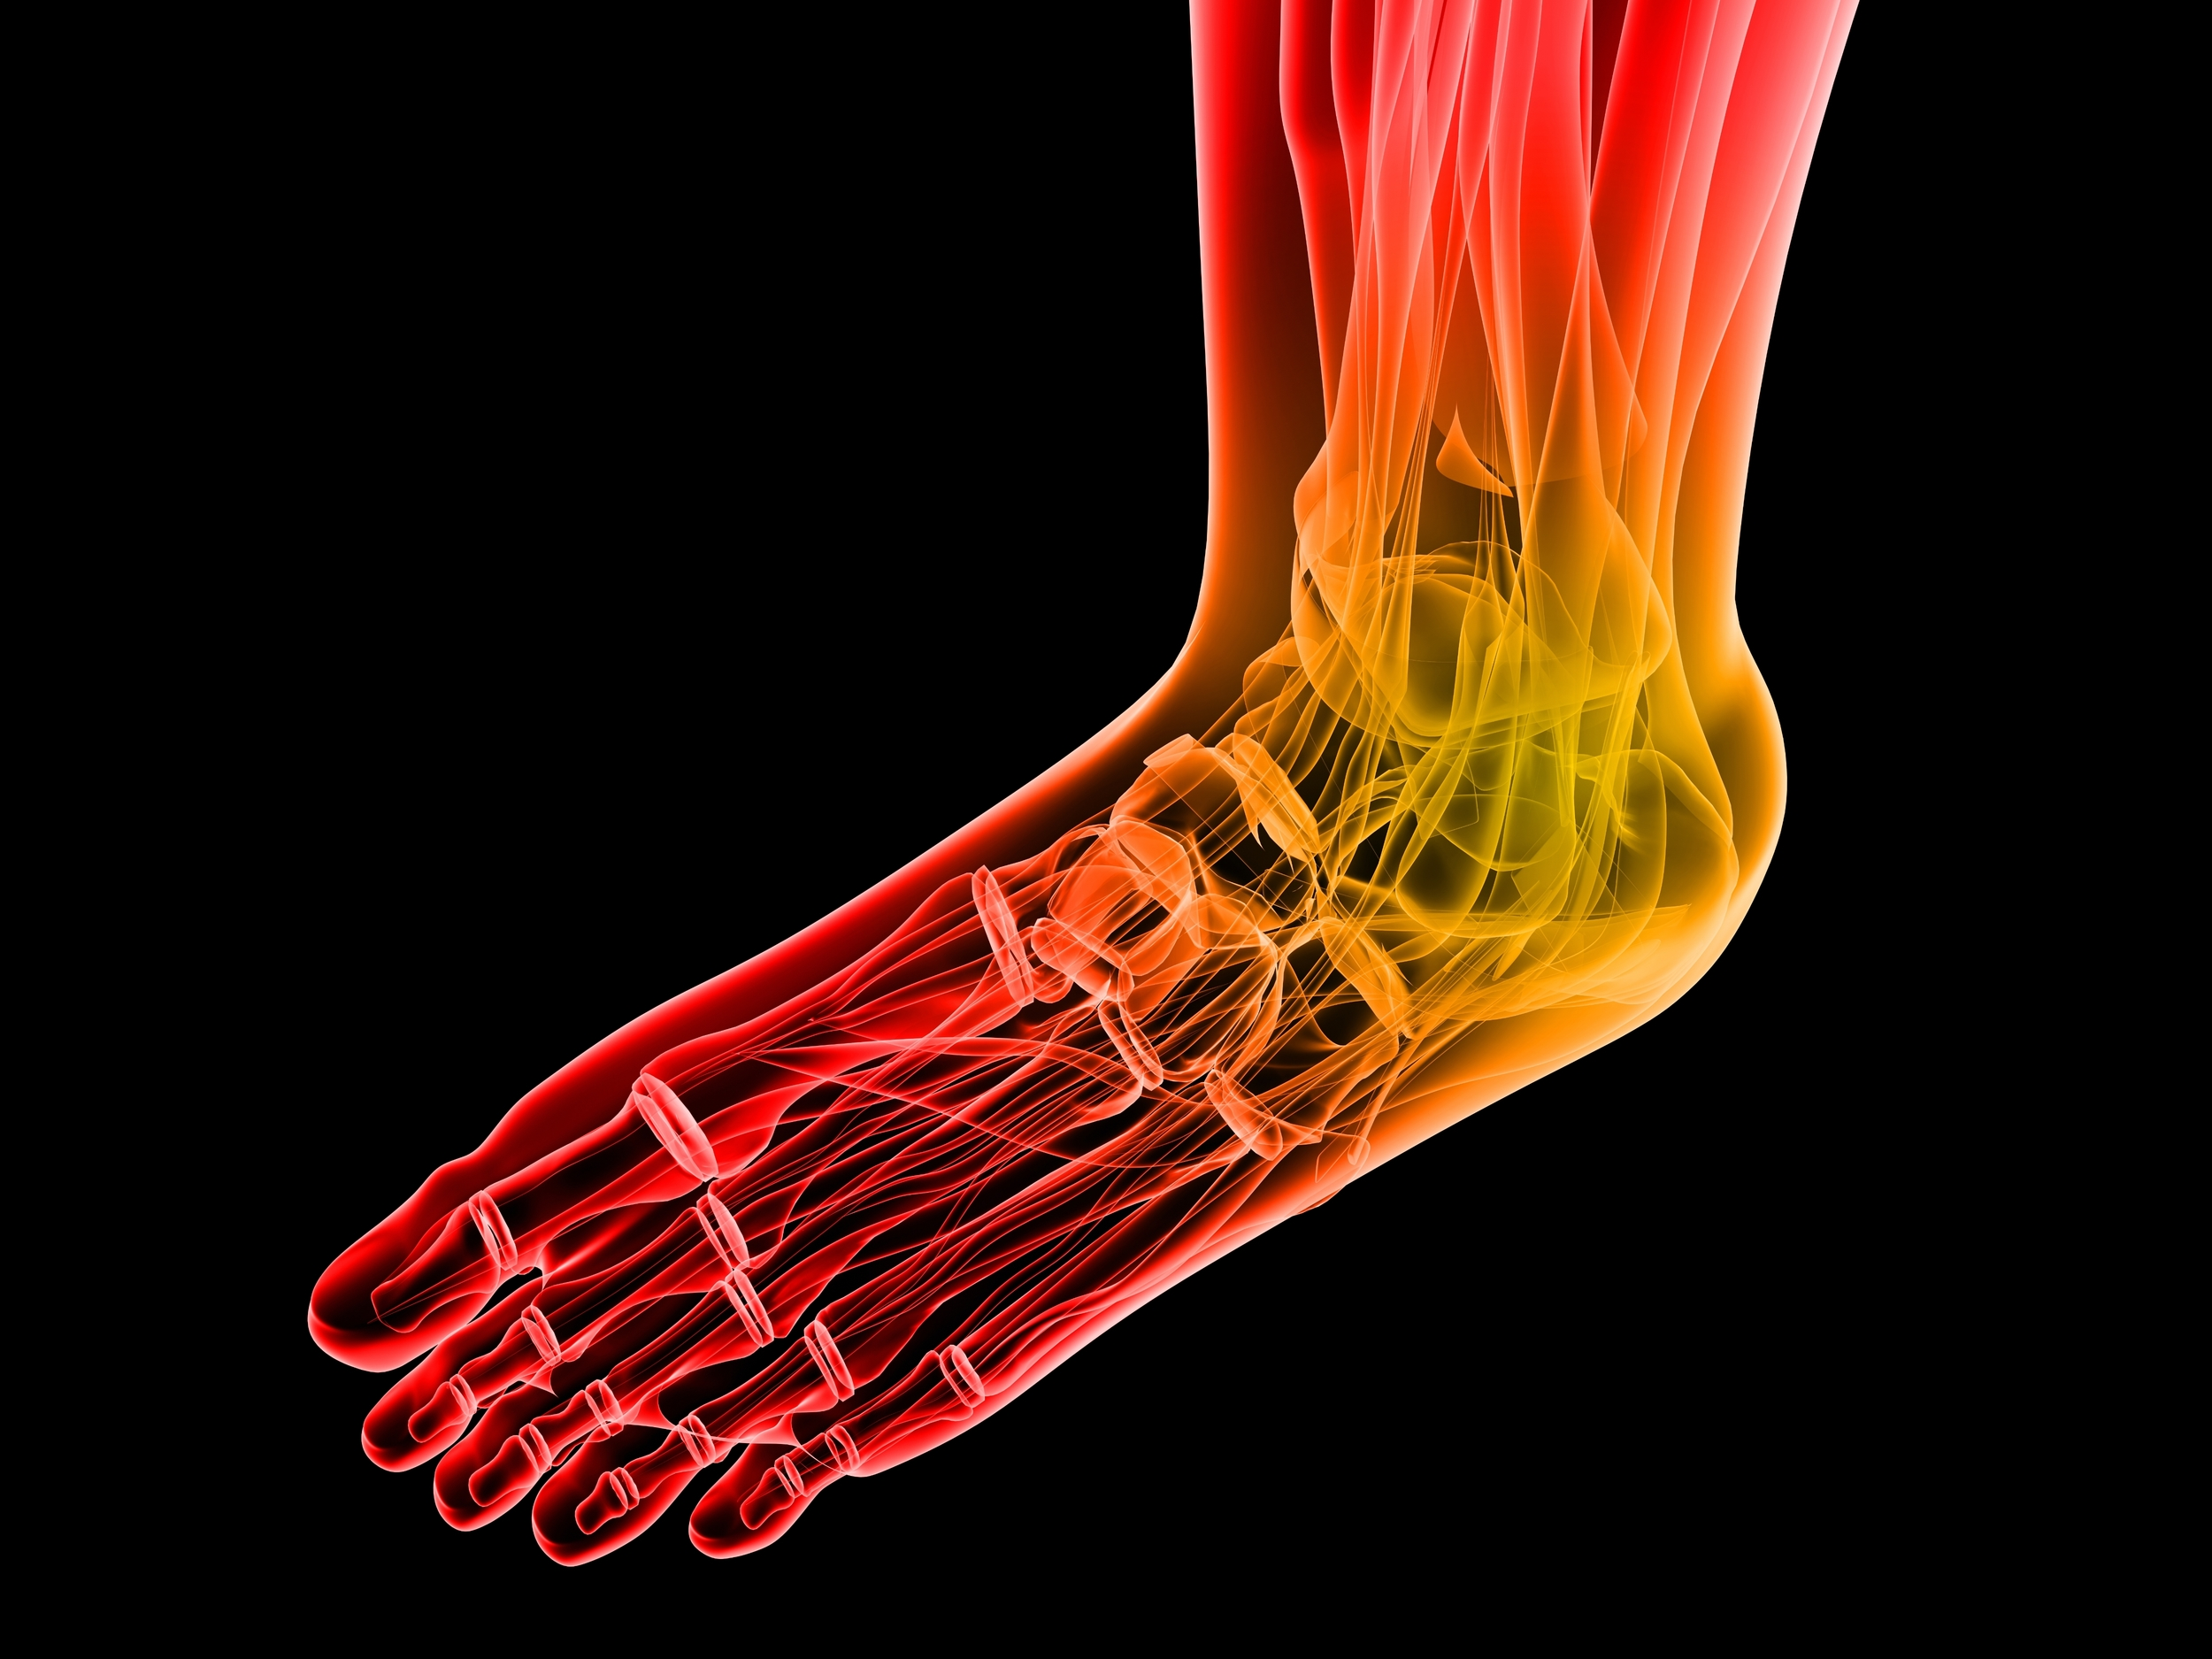 diabetic foot carel Jonesboro AR Podiatrist Mark Reiner